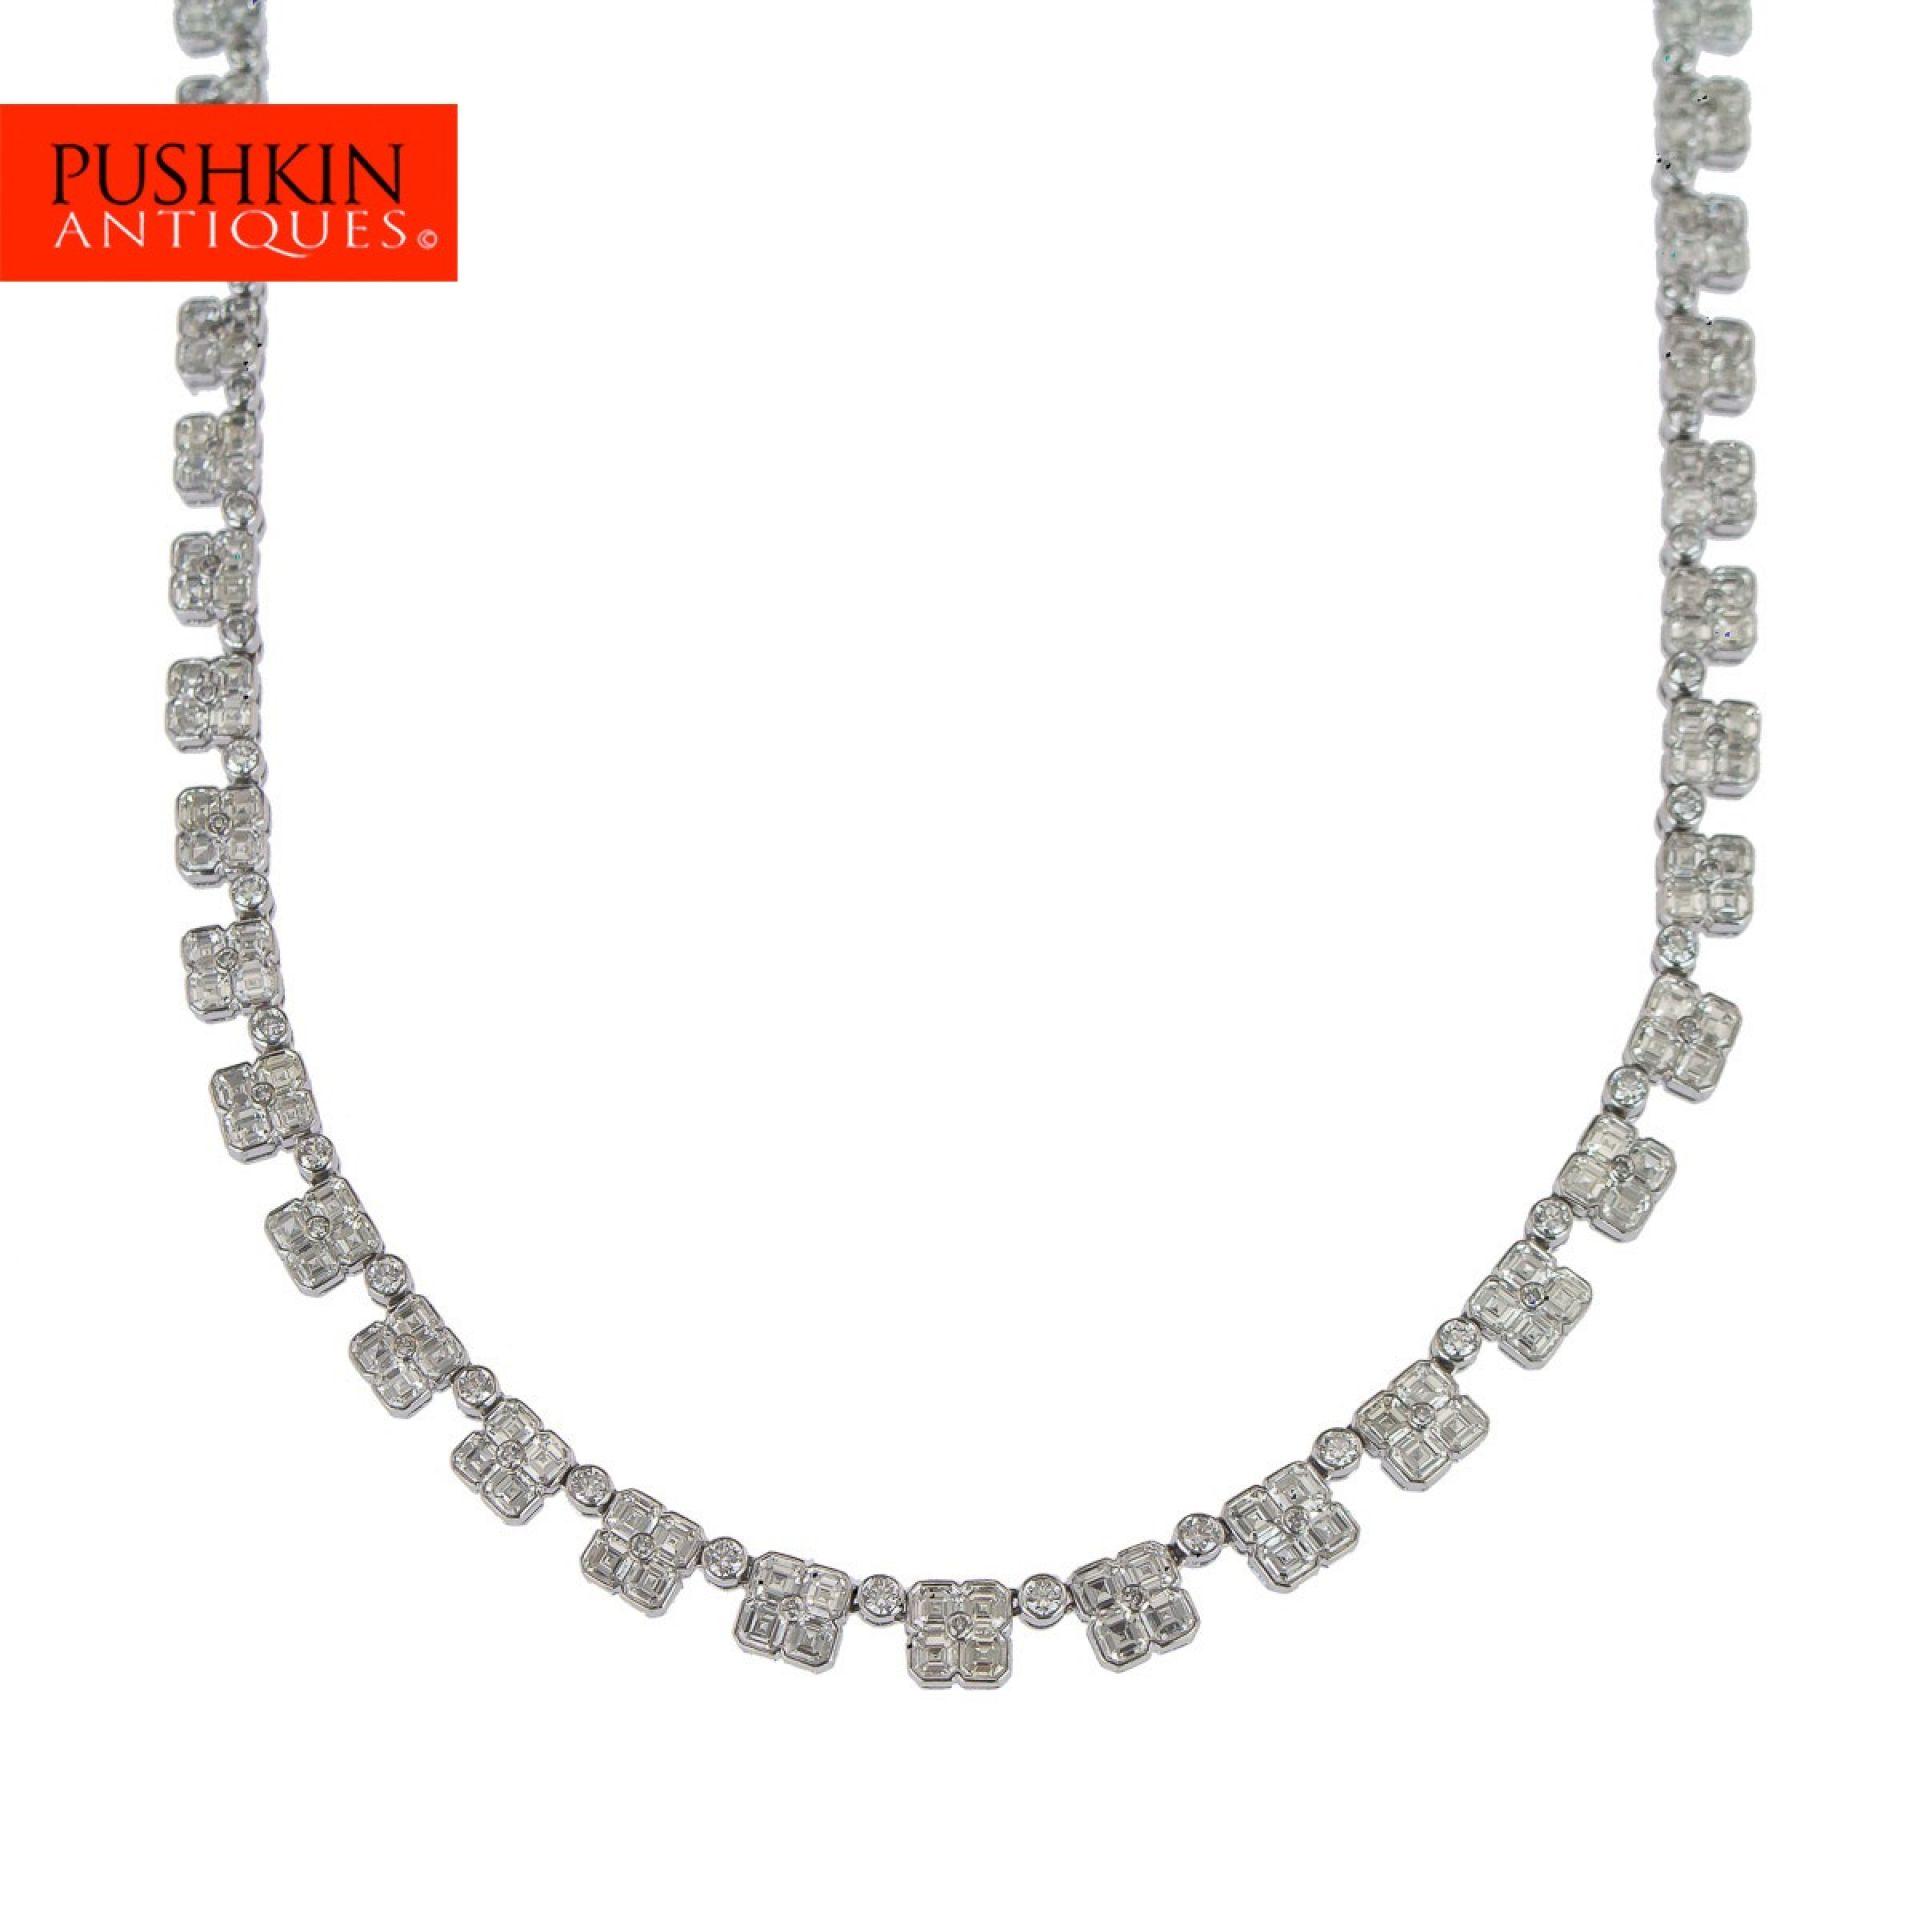 ELEGANT DIAMOND SET 18K (750) WHITE GOLD NECKLACE